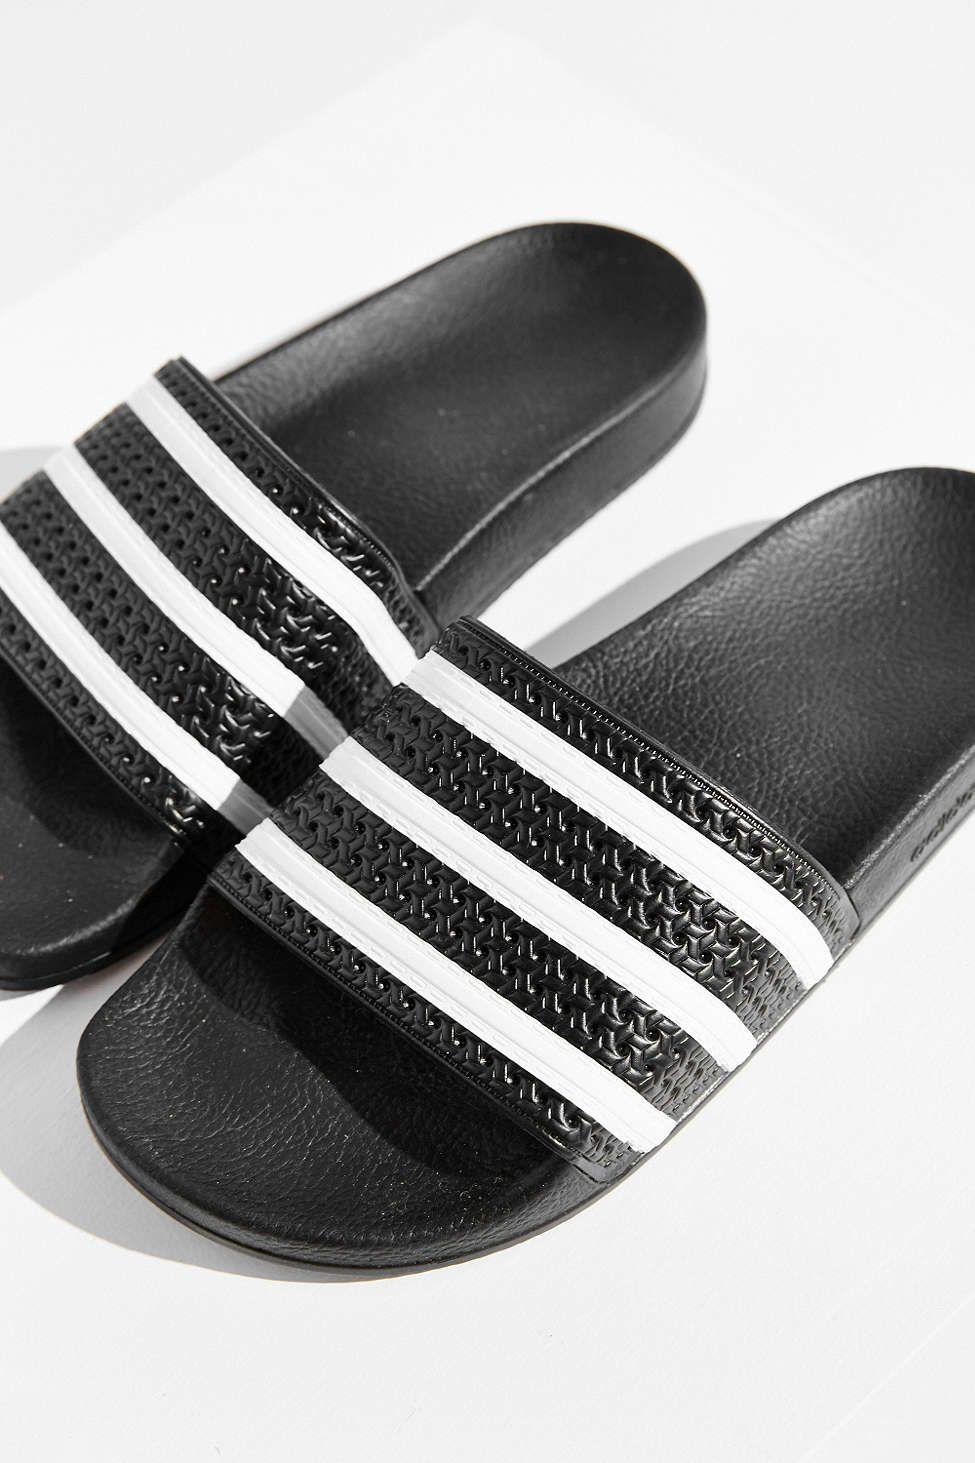 meet 1e2f4 fcc2c adidas Originals Adilette Pool Slide Sandal  vegan shoes